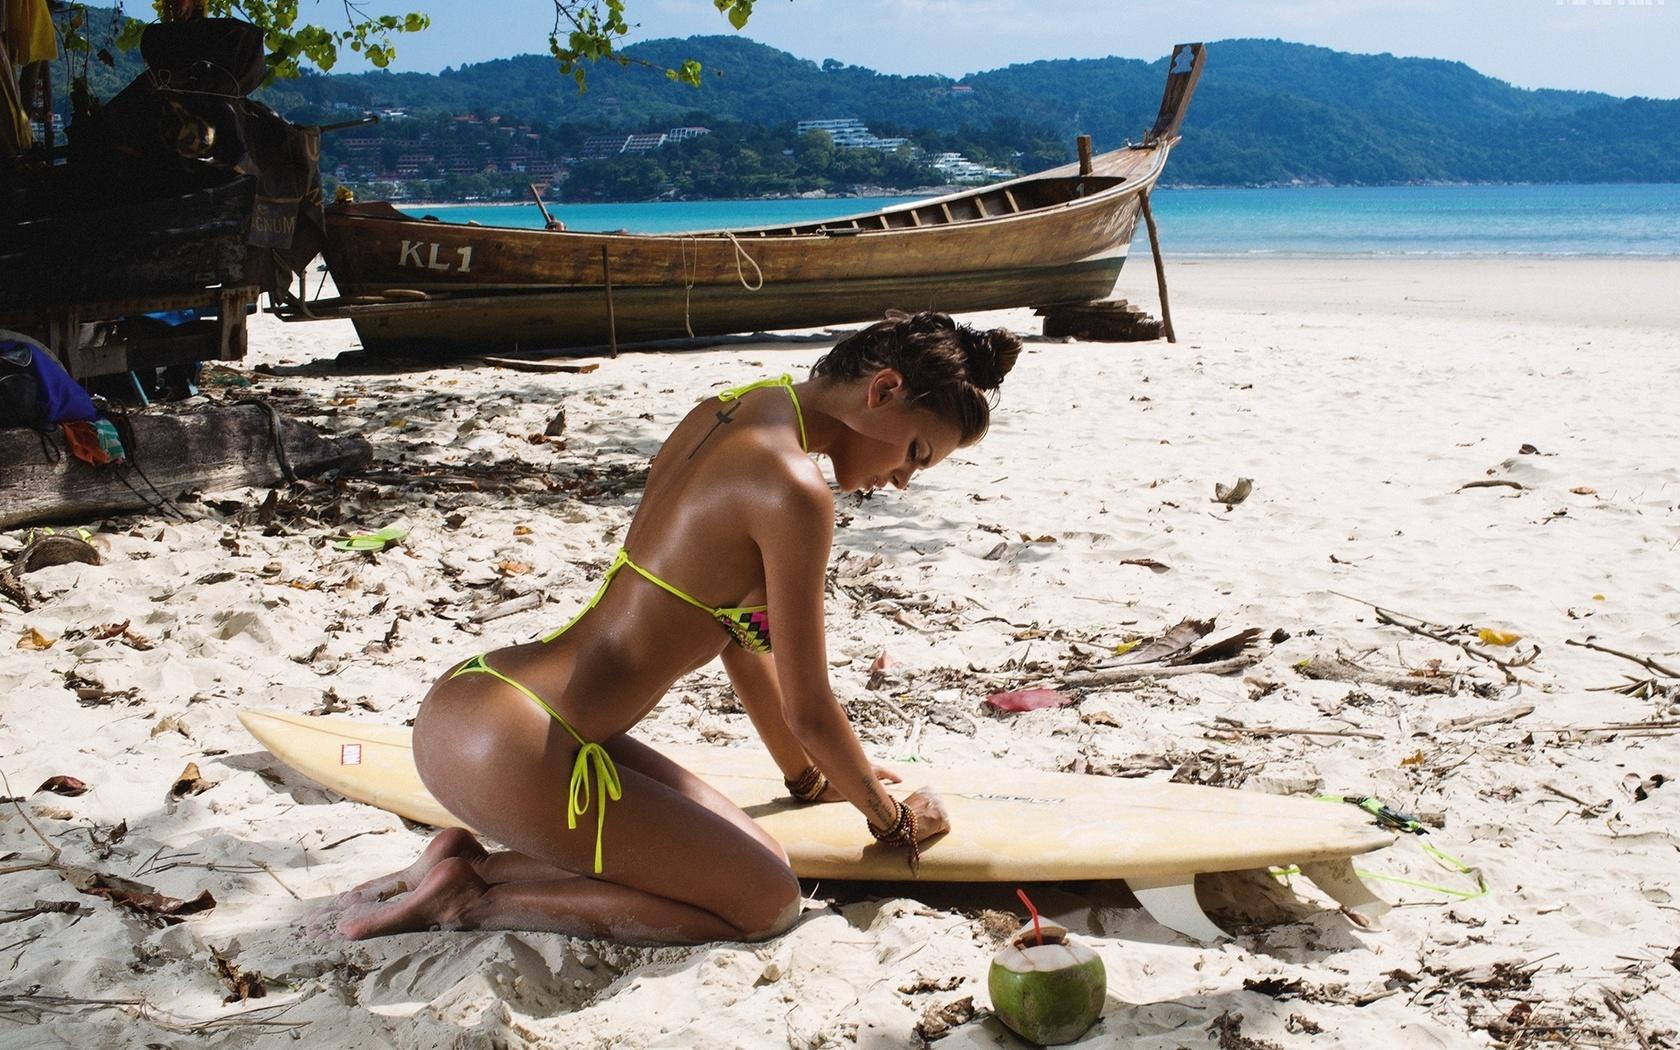 Kapoor nude images of beautiful nude girls in goa beach fuck her